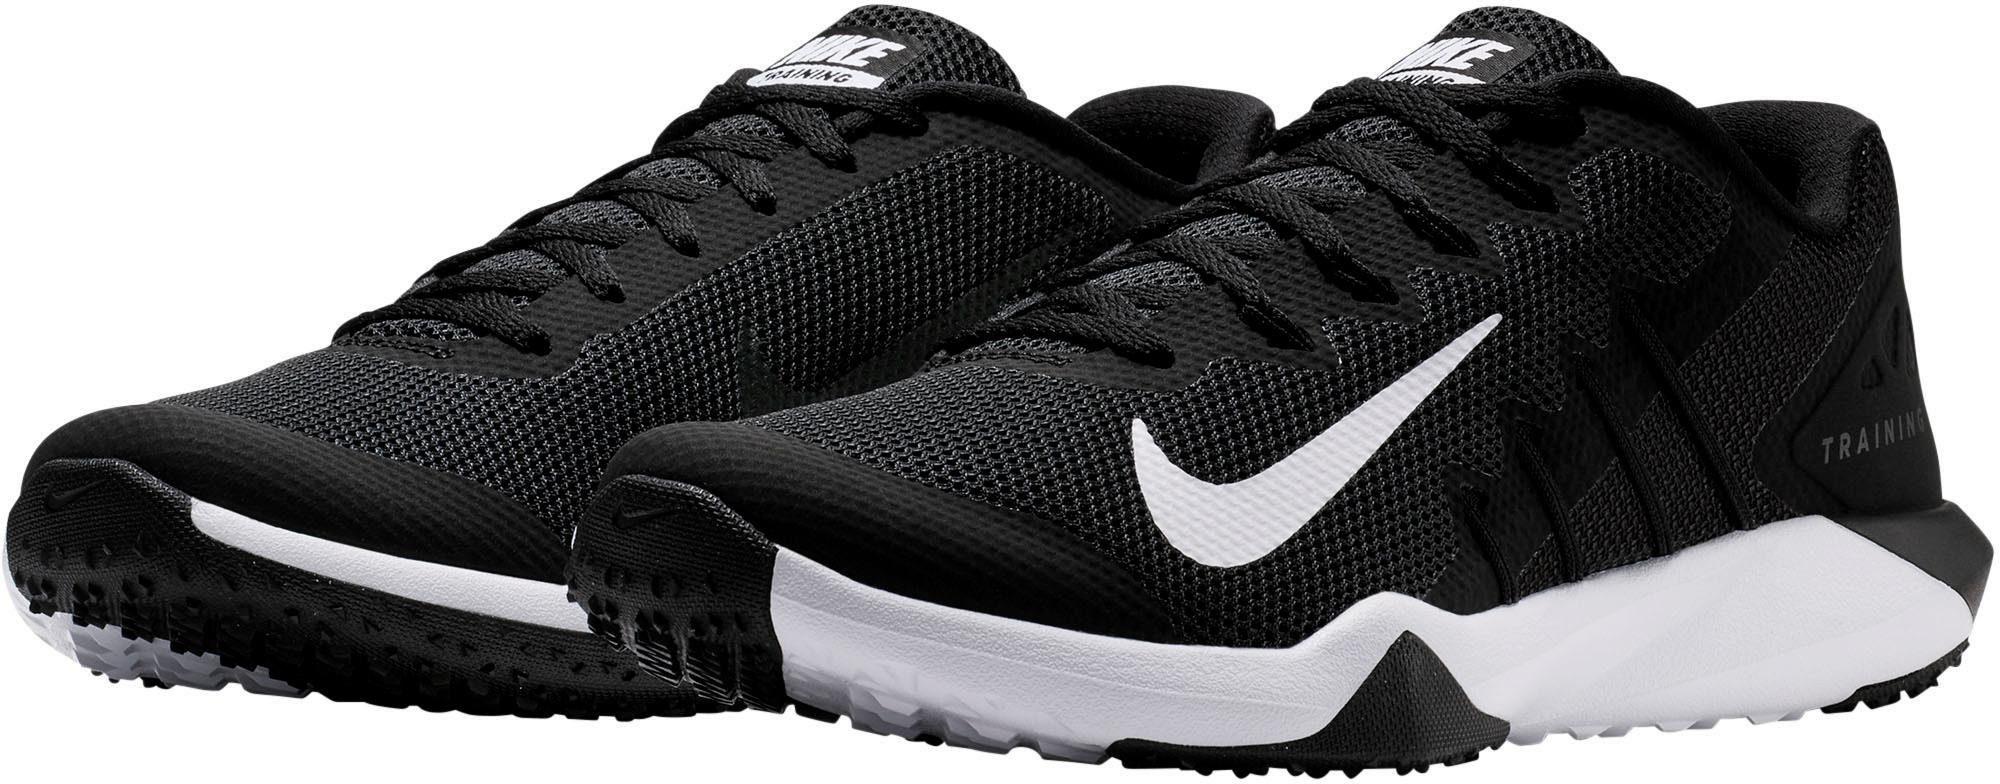 Nike »Retaliation Trainer 2« Trainingsschuh